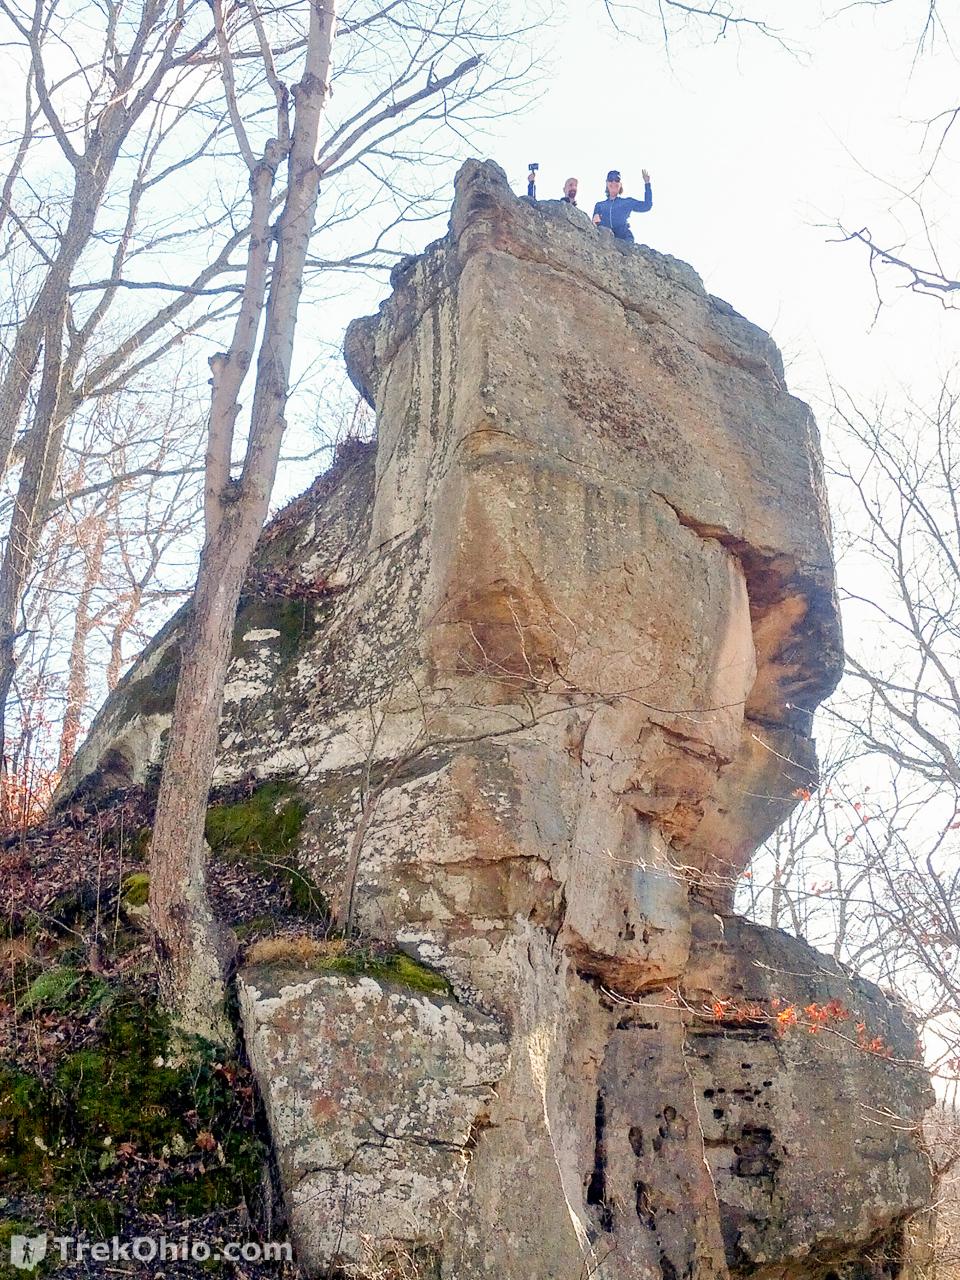 Zaleski State Forest Lookout Rock  TrekOhio